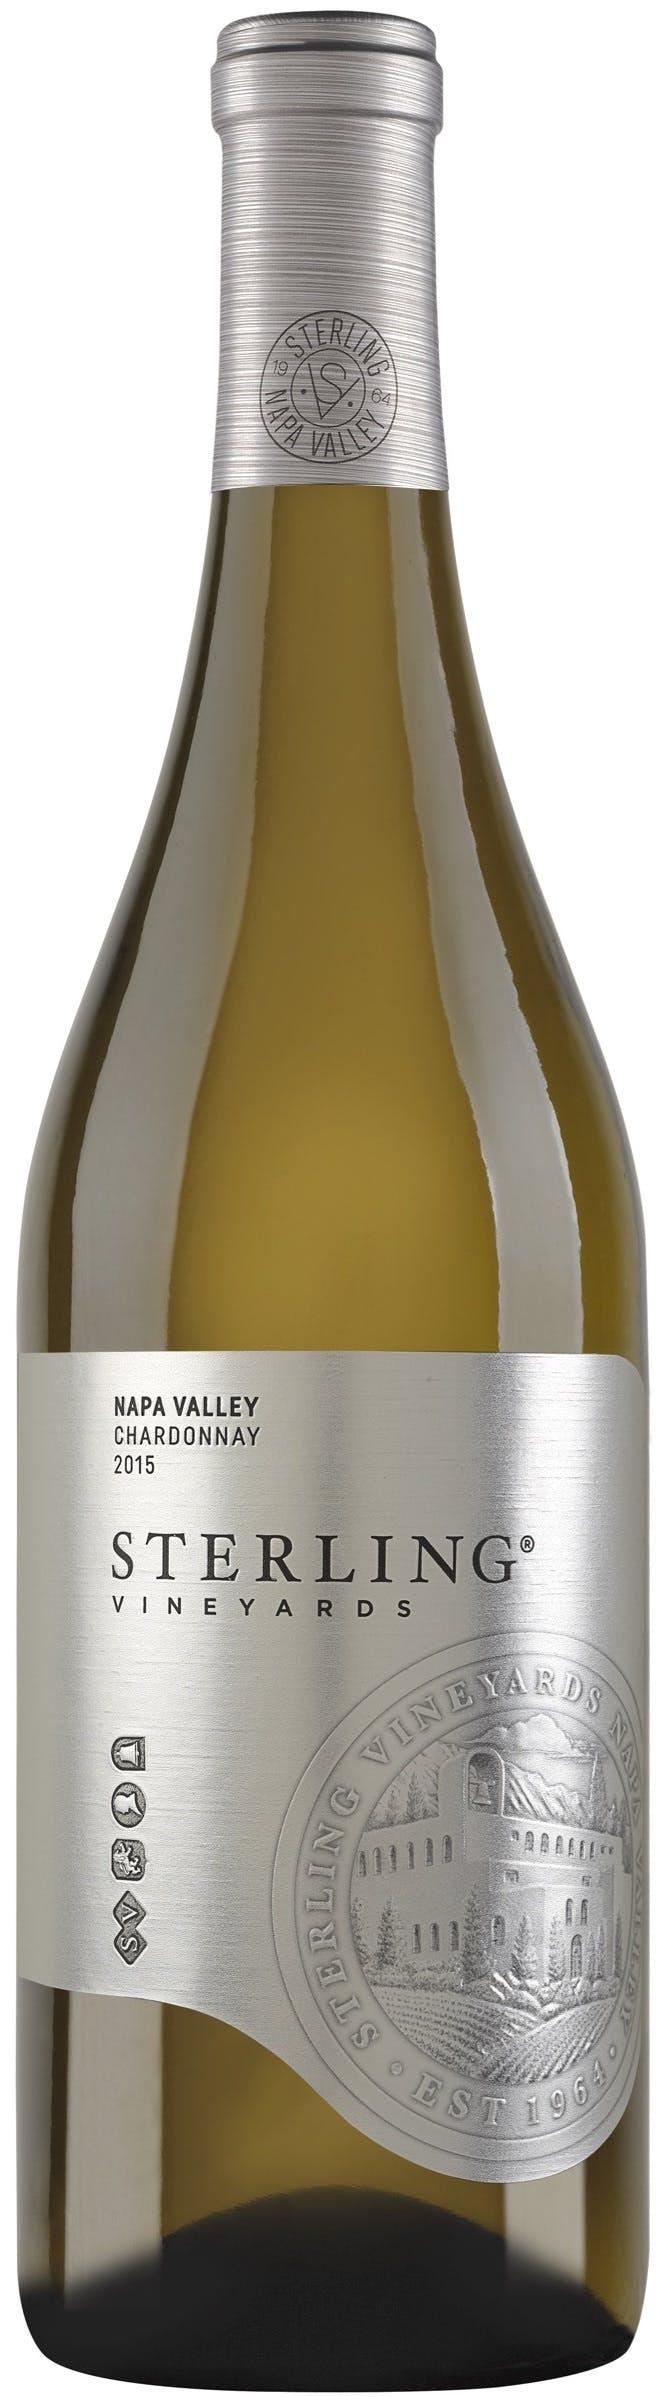 Sterling Napa Valley Chardonnay 2015 750ml